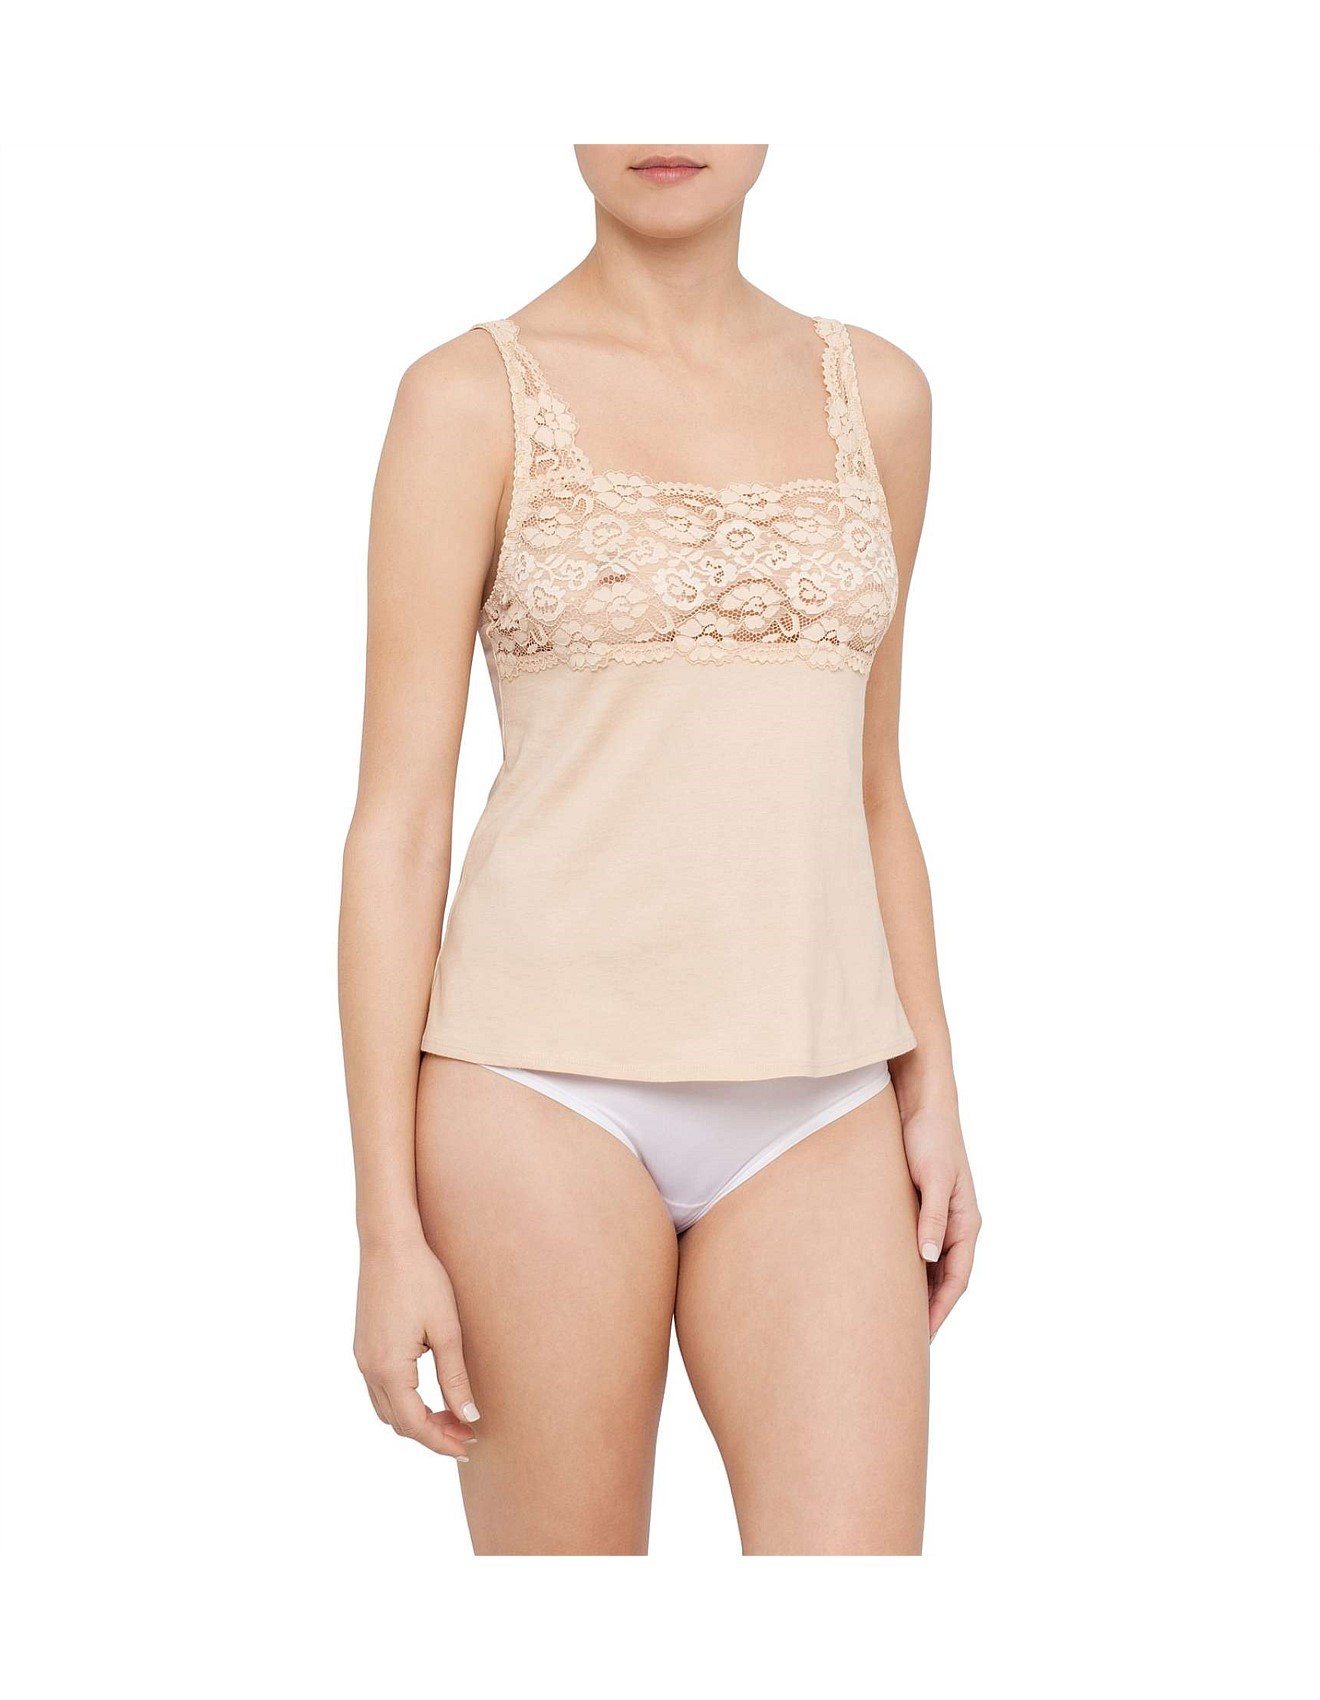 9f9069f7b52a61 Cotton   Lace Camisole